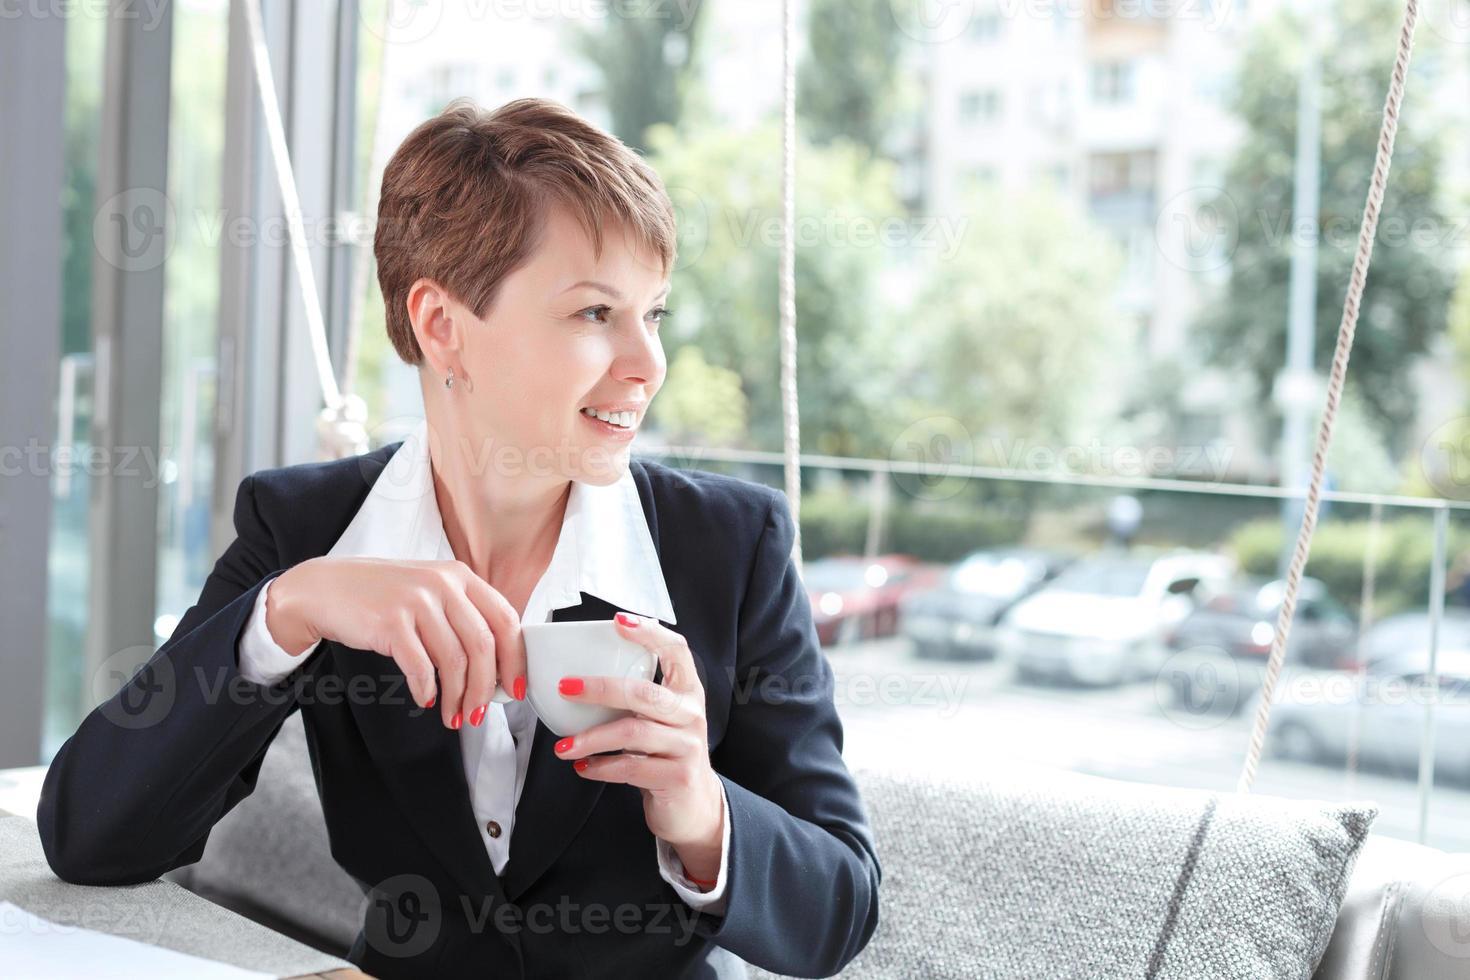 Businesswoman on a break photo